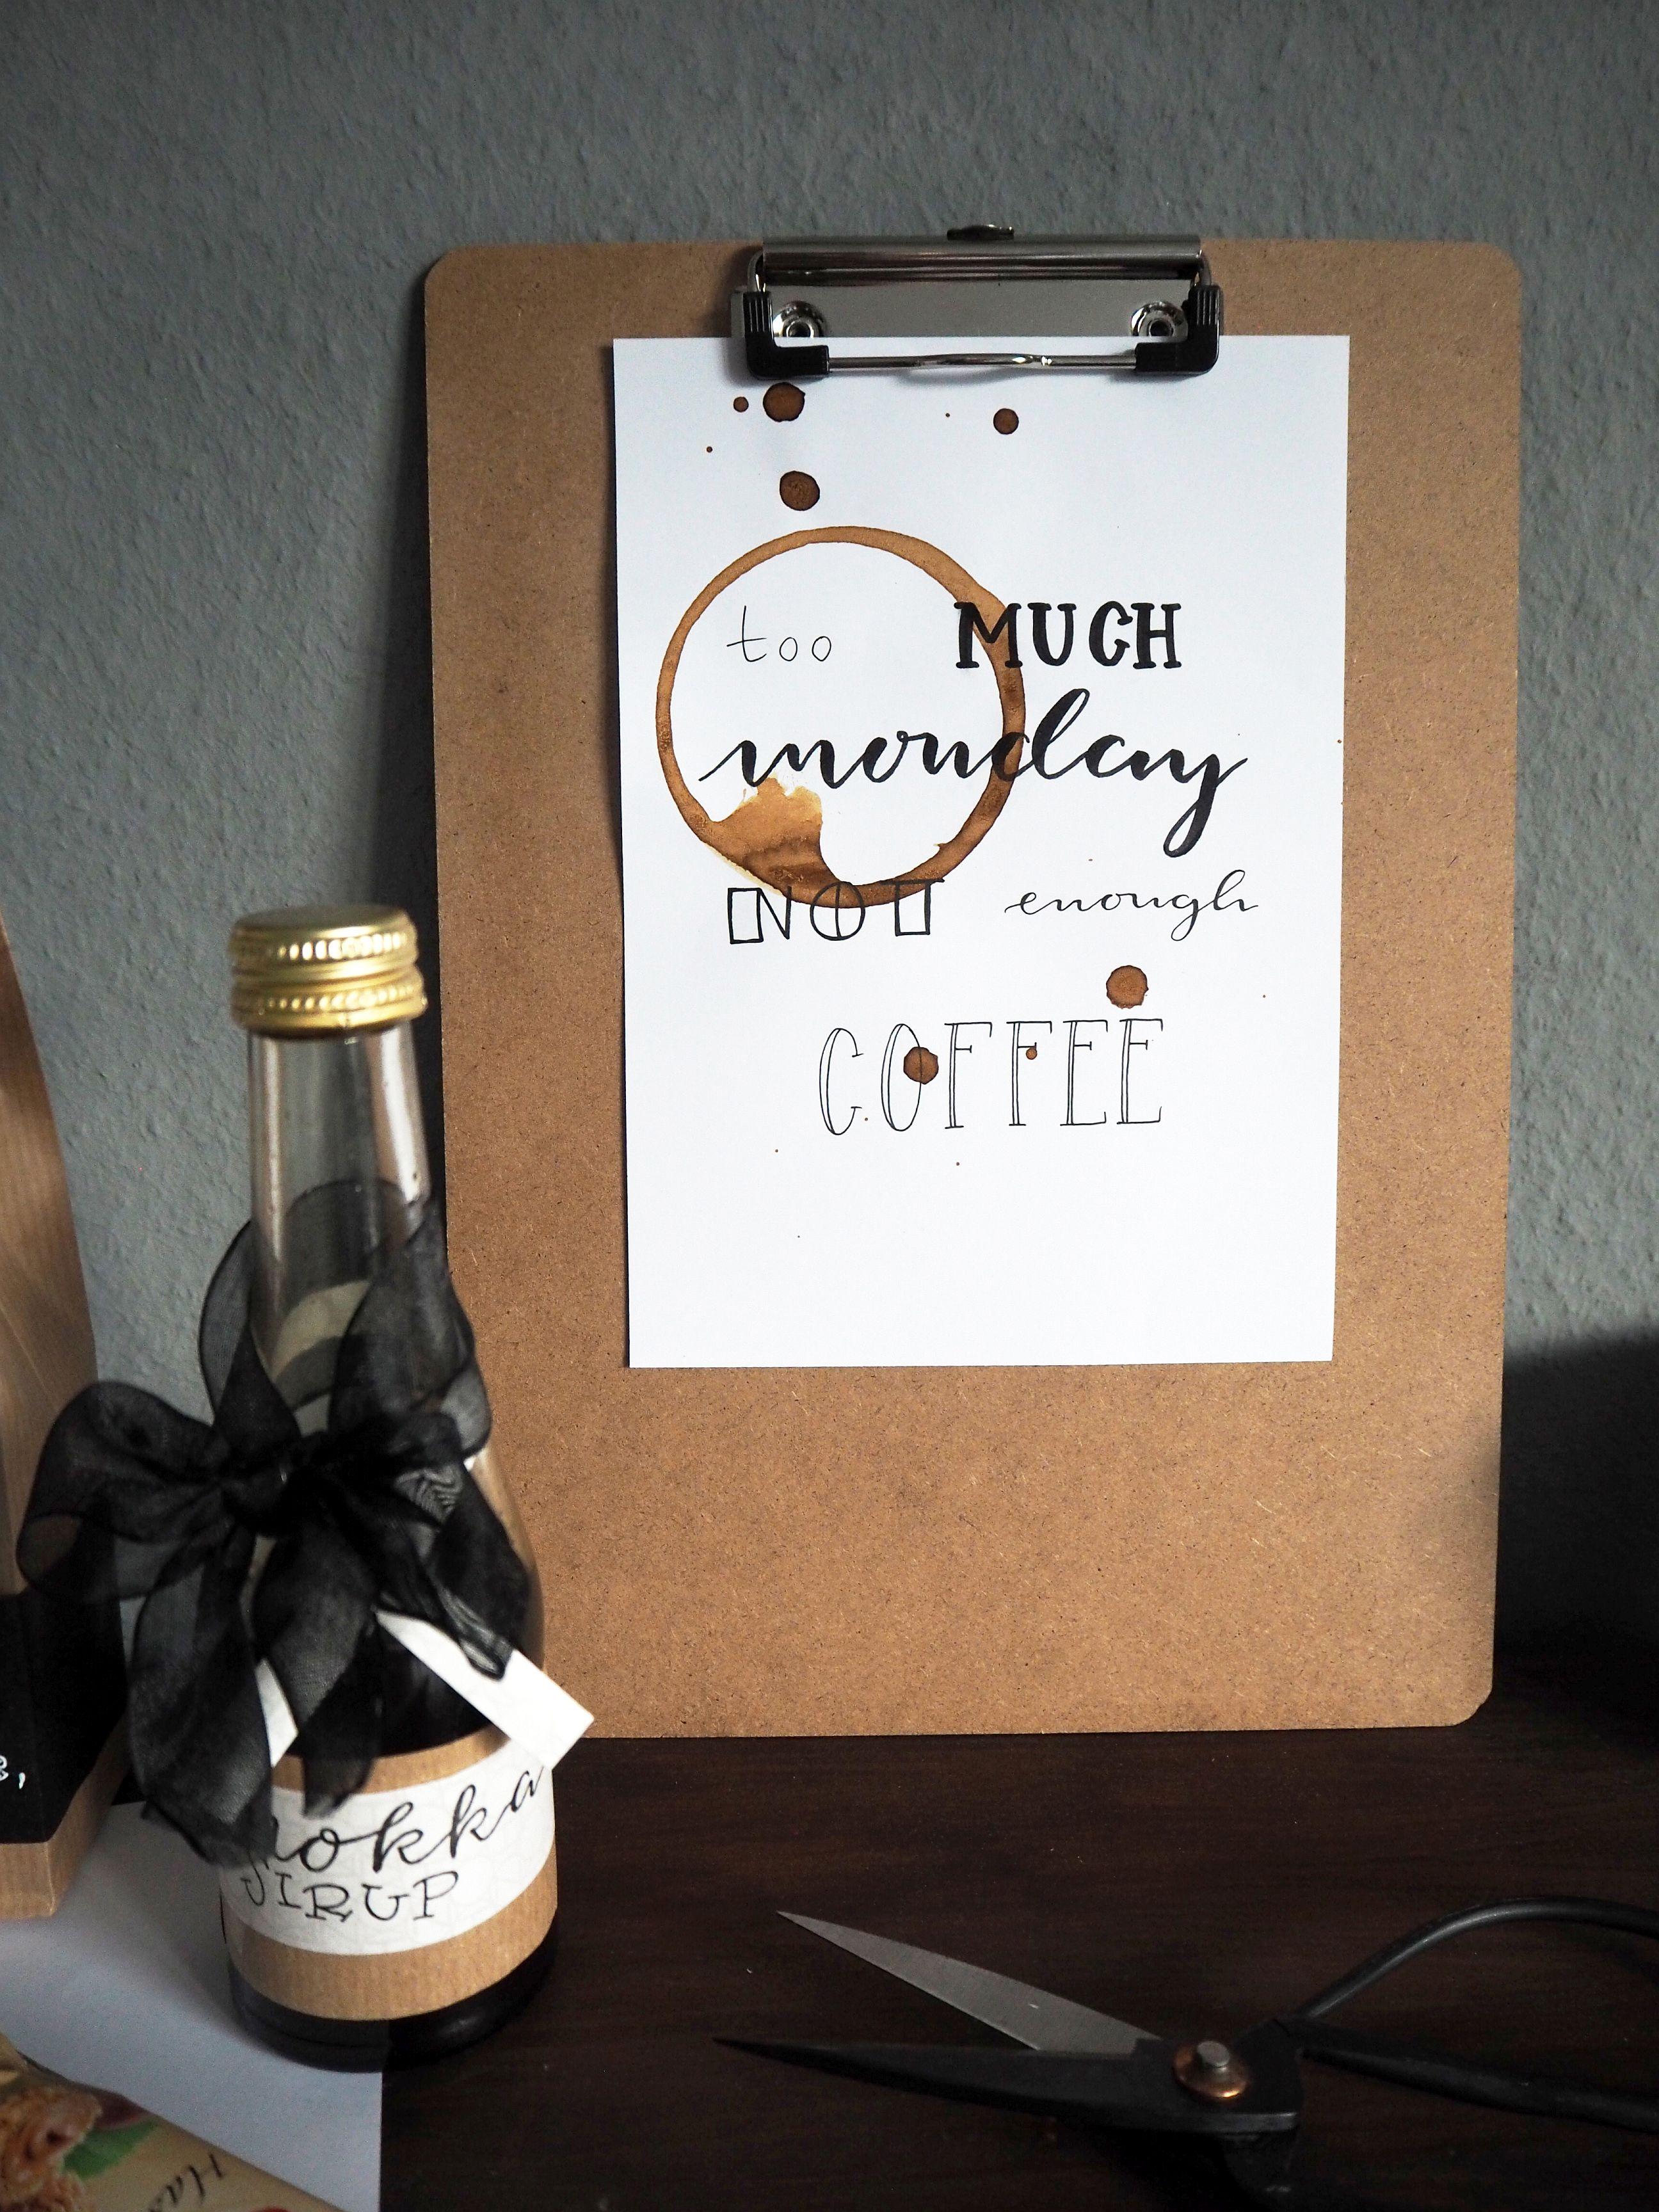 2018-05-skoen-och-kreativ-diy-lettering-set-fuer-kaffee-auszeit-zum-vatertag (3)